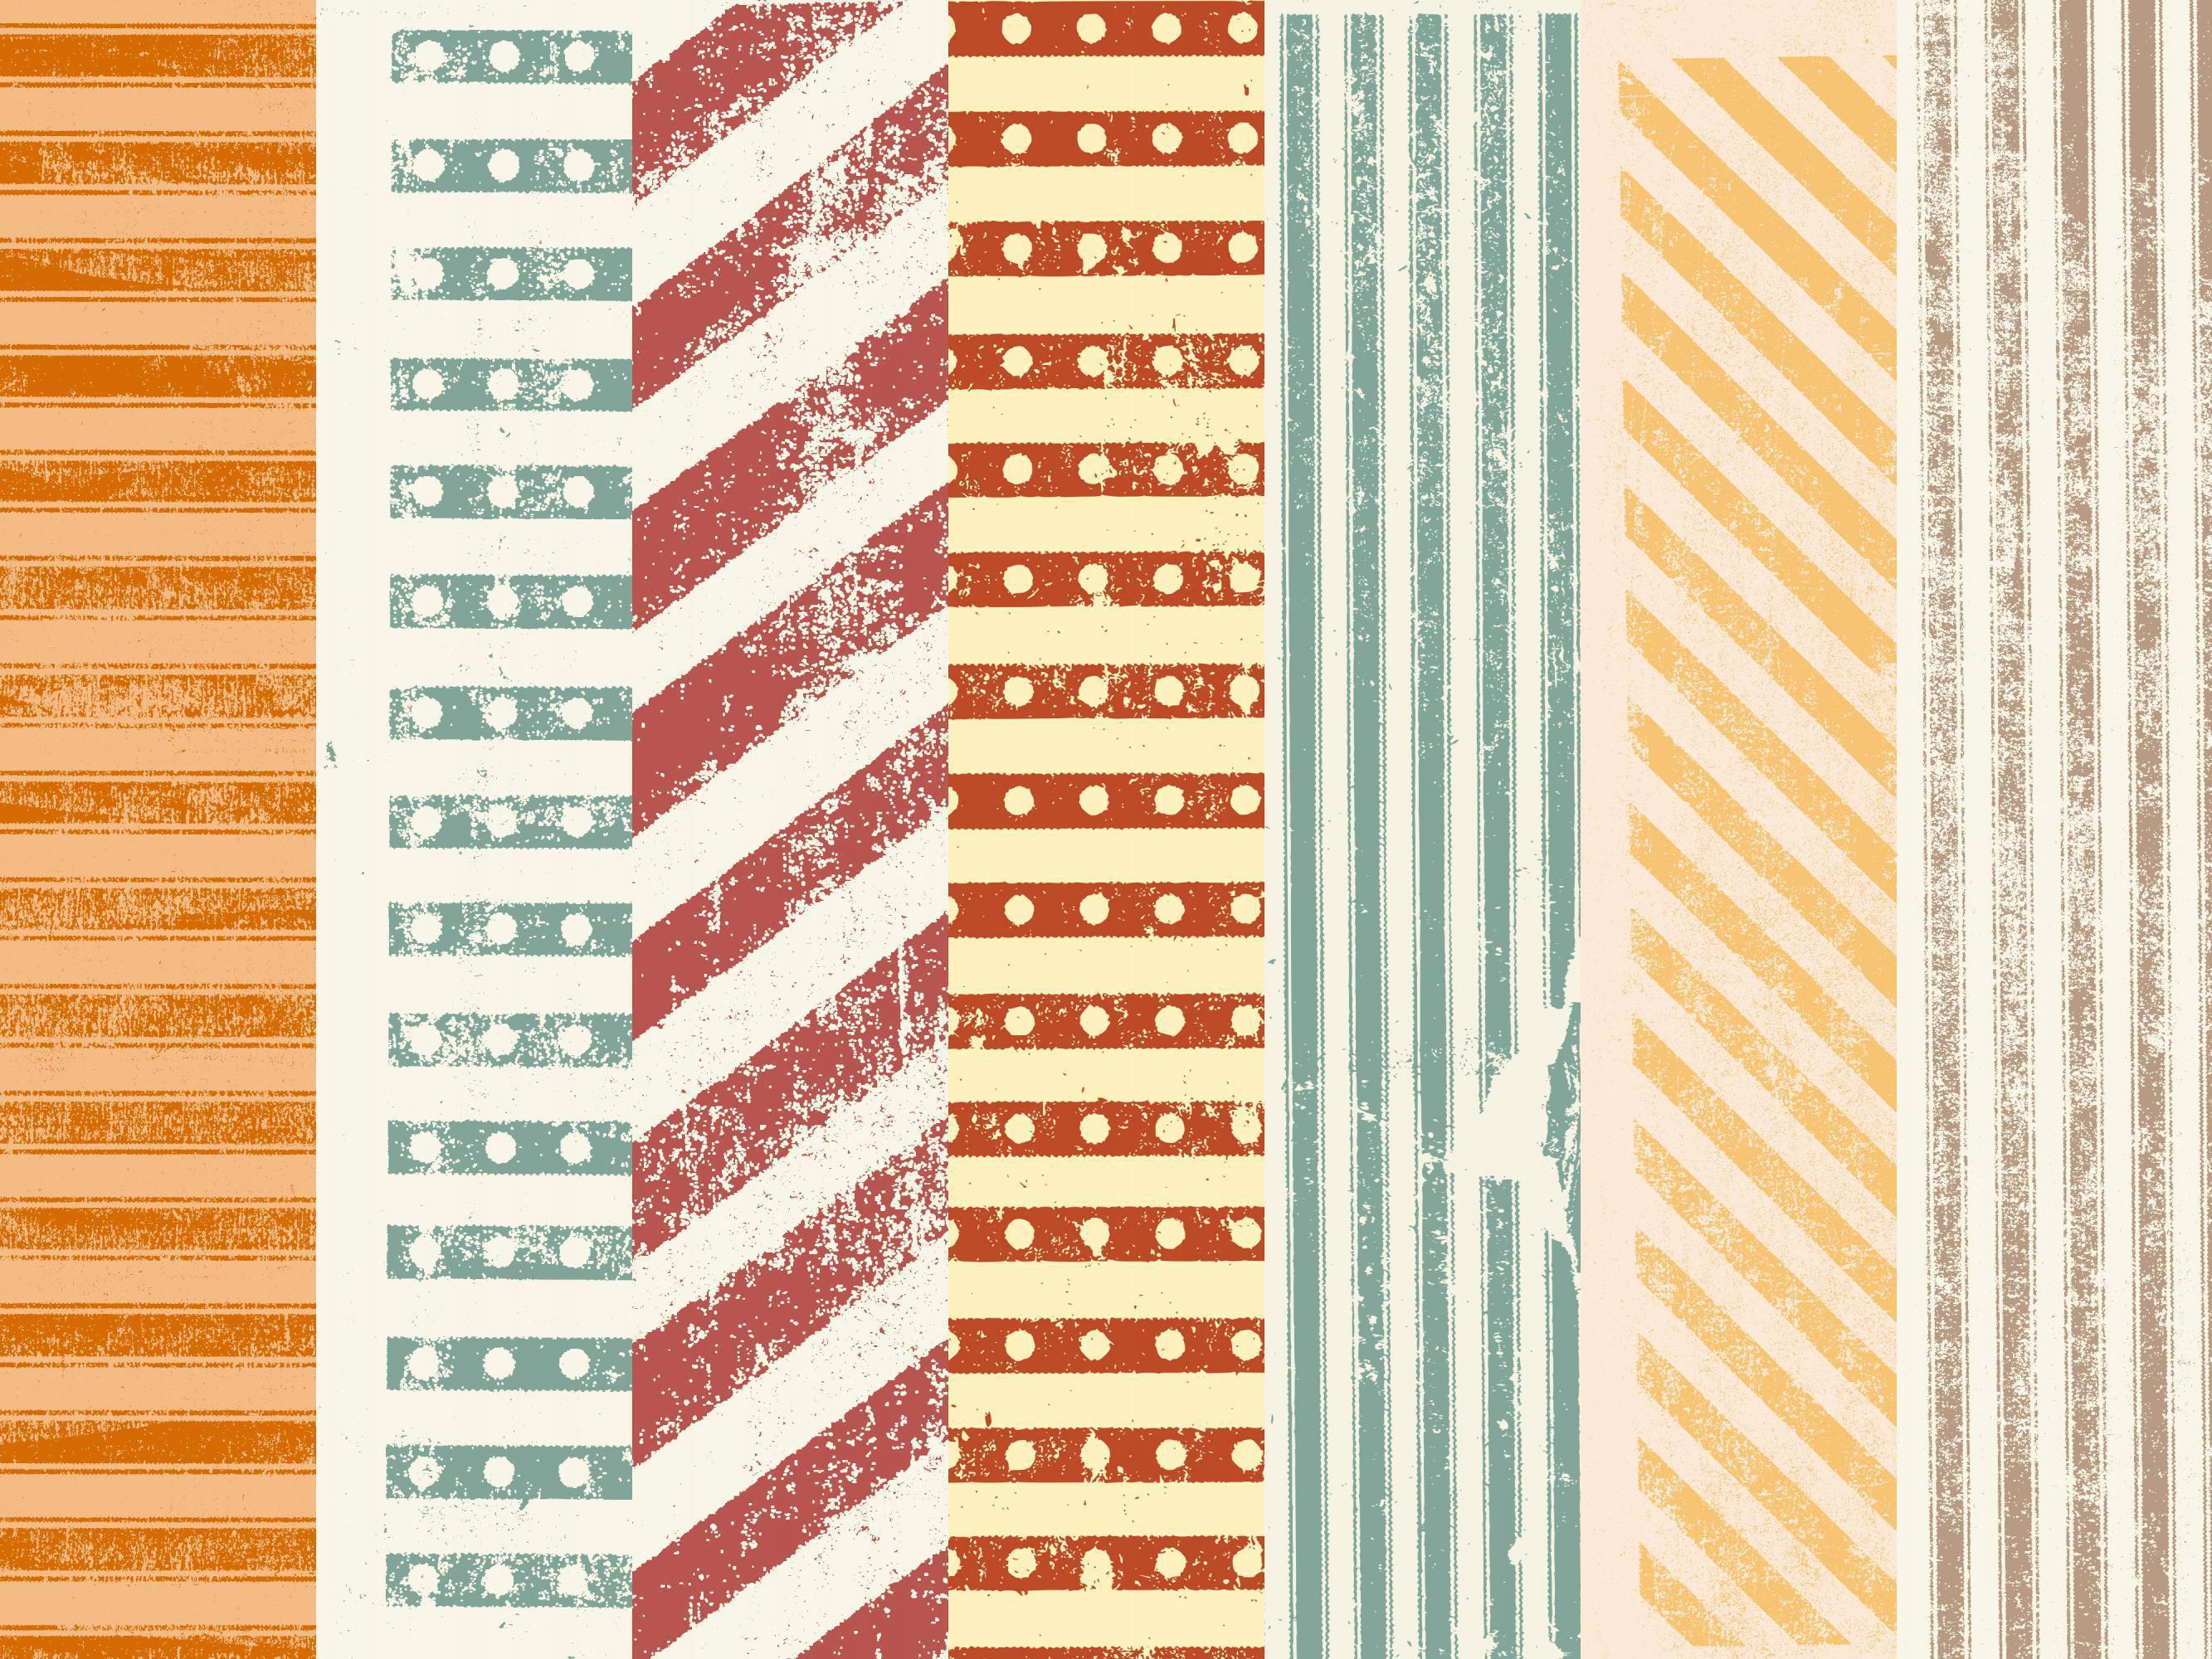 grunge-stripes-retro-background-cover.jpg